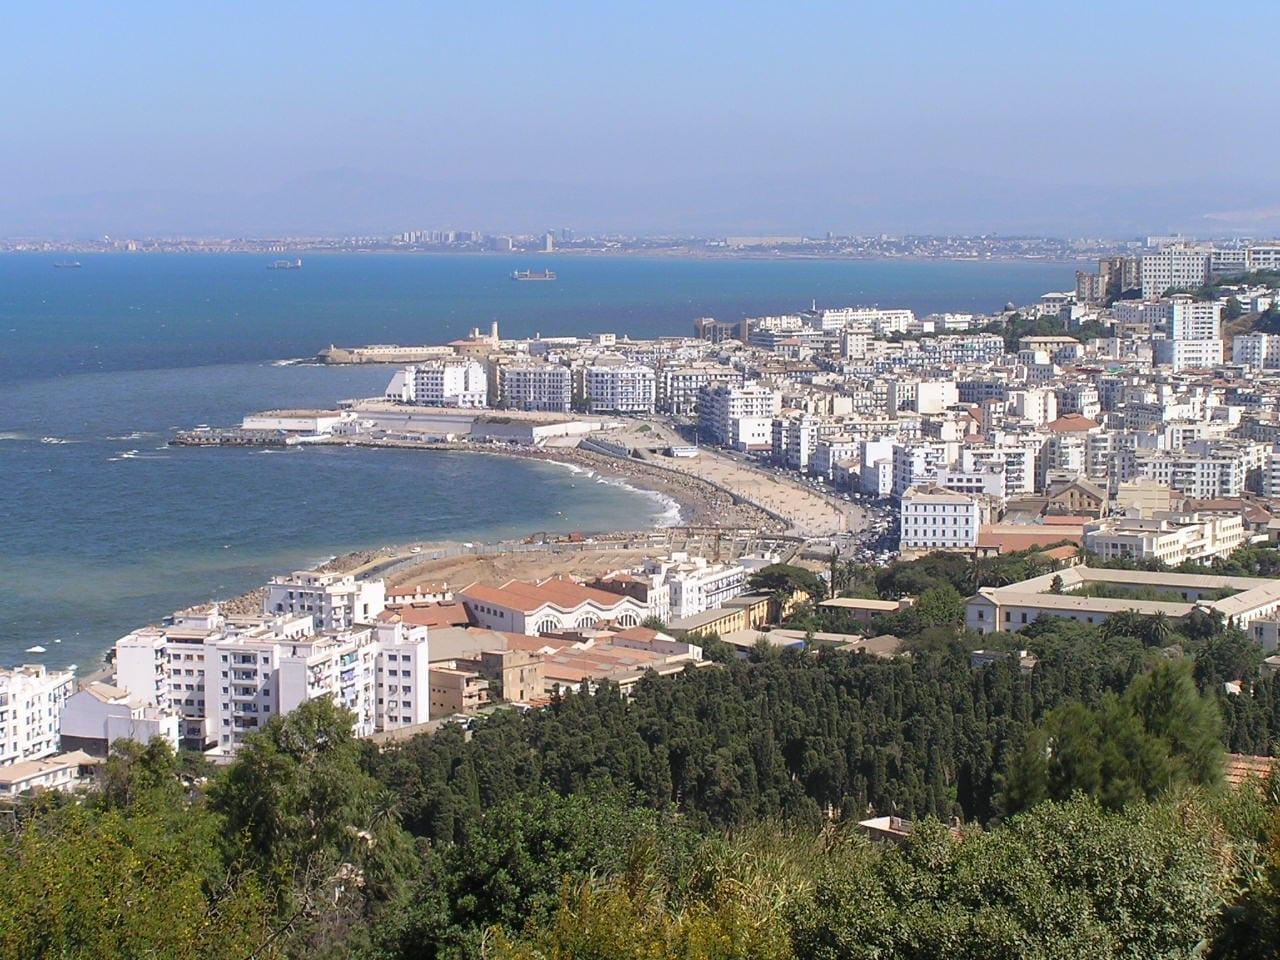 Vista de Argel Argel Argelia